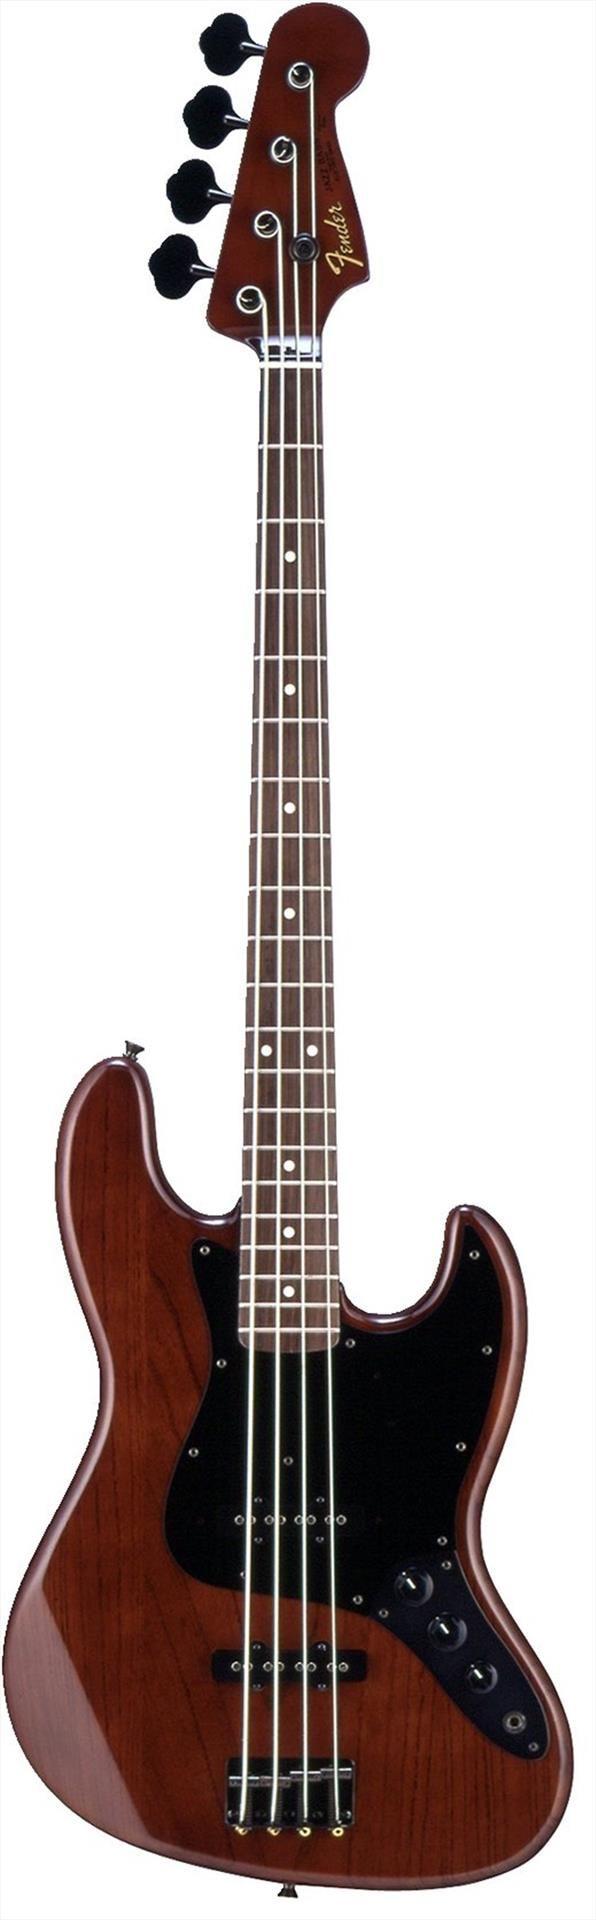 Fender Japan Exclusive Classic 60s Jazz Bass Walnut